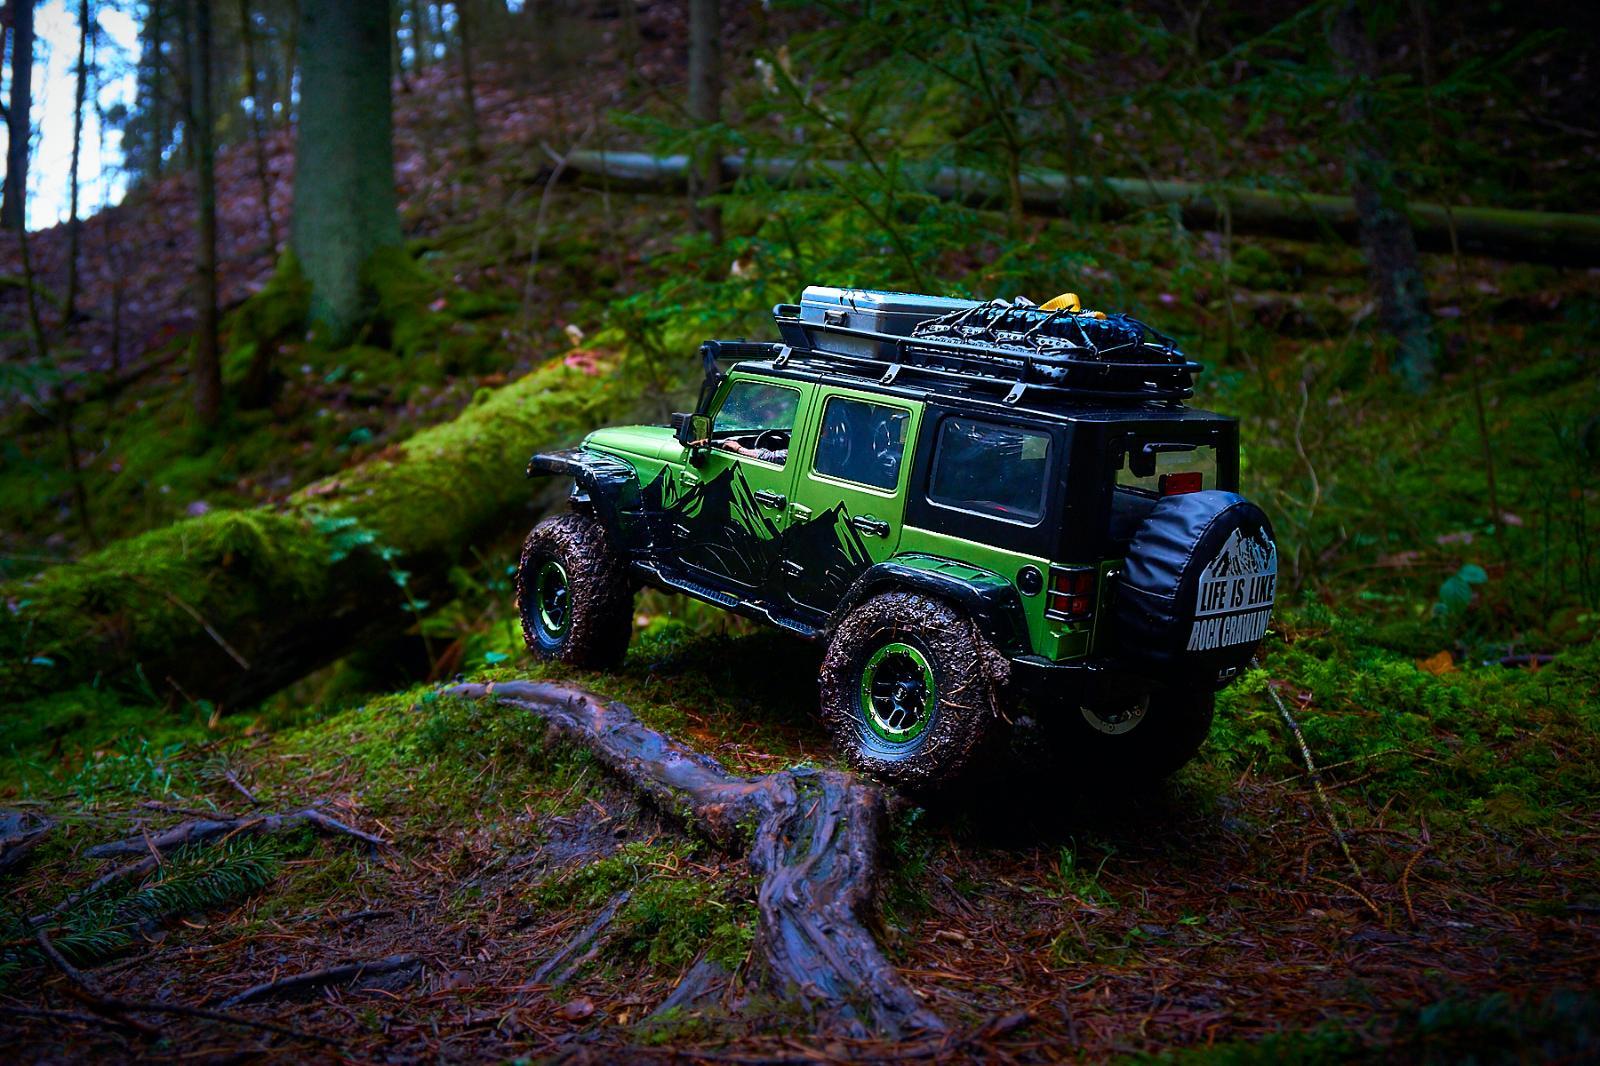 Jeep Wrangler Jk >> Buster's Traxxas TRX-4 mit New Bright Jeep Wrangler JK 4door Karo....Fotos by Bambelbi ...